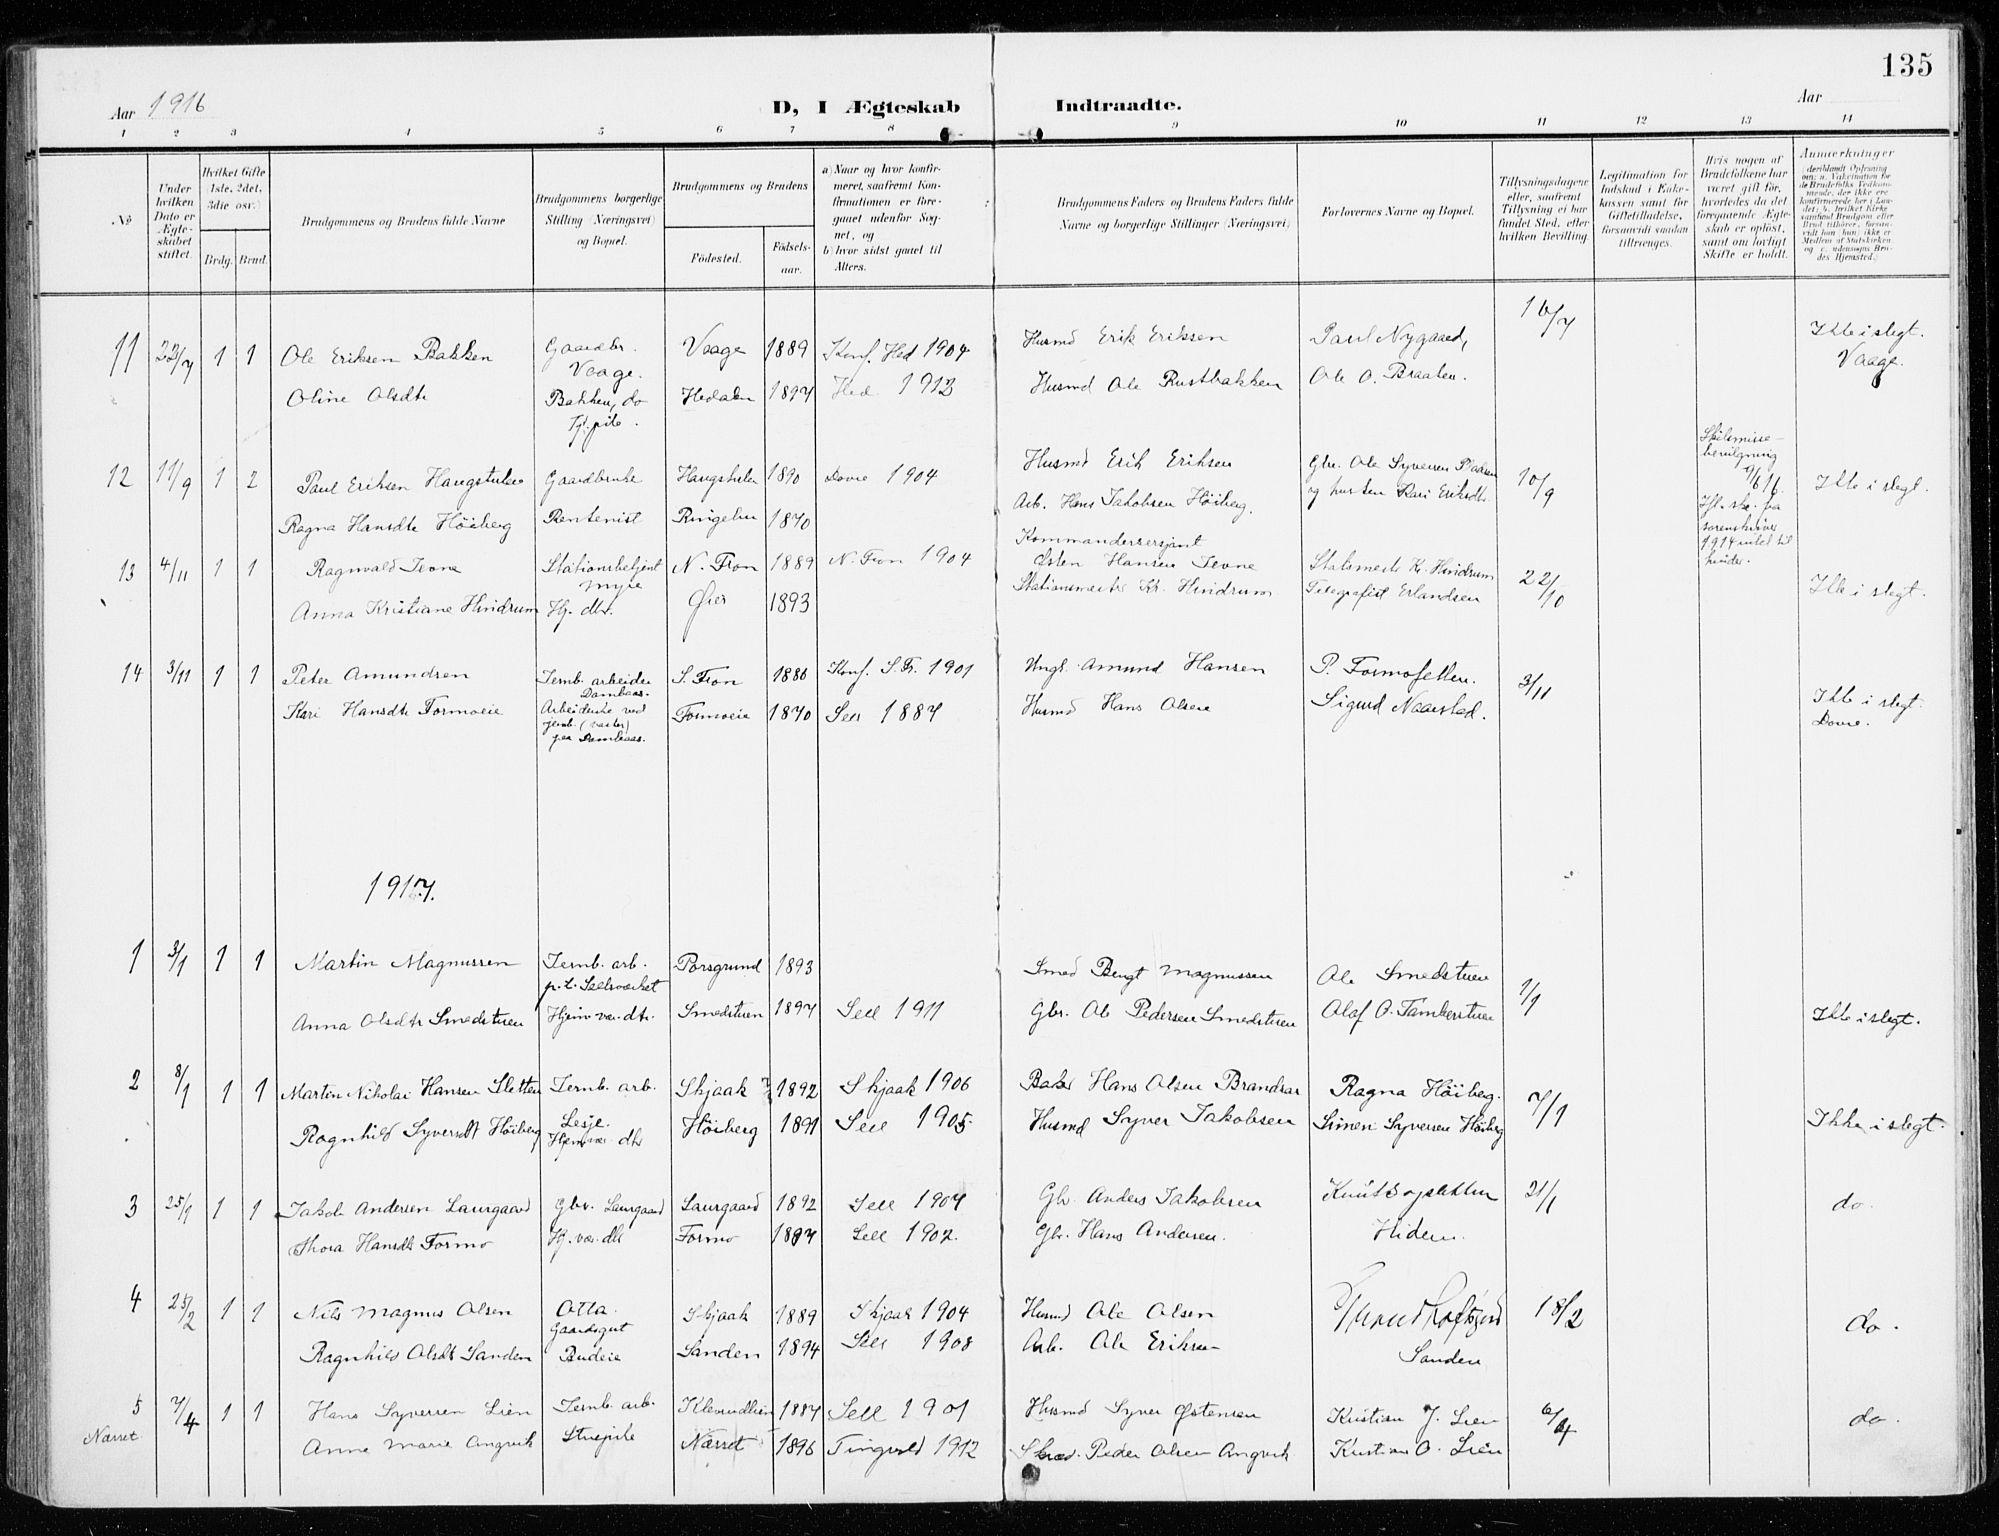 SAH, Sel prestekontor, Ministerialbok nr. 2, 1905-1919, s. 135